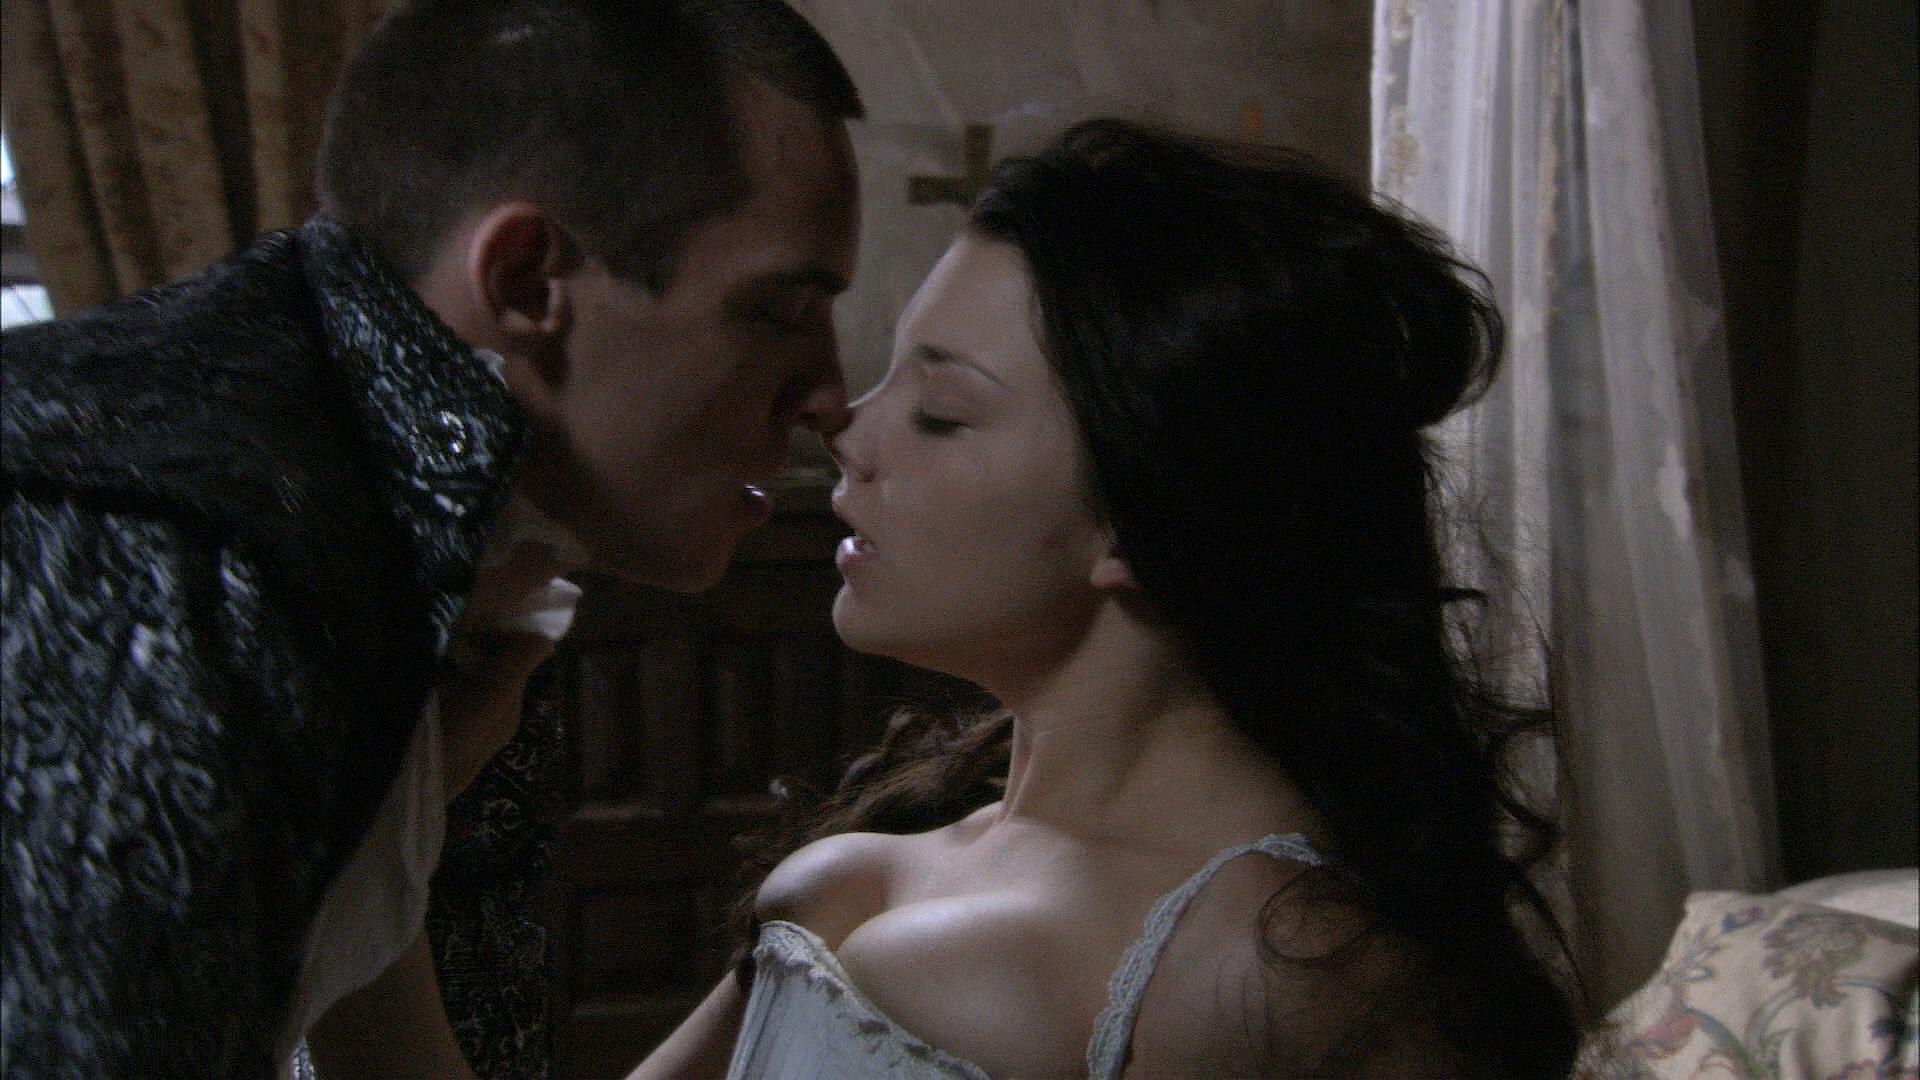 Natalie Dormer hot sex and Gabrielle Anwar hot - The Tudors (2007) S01E05 HD 1080p (2)